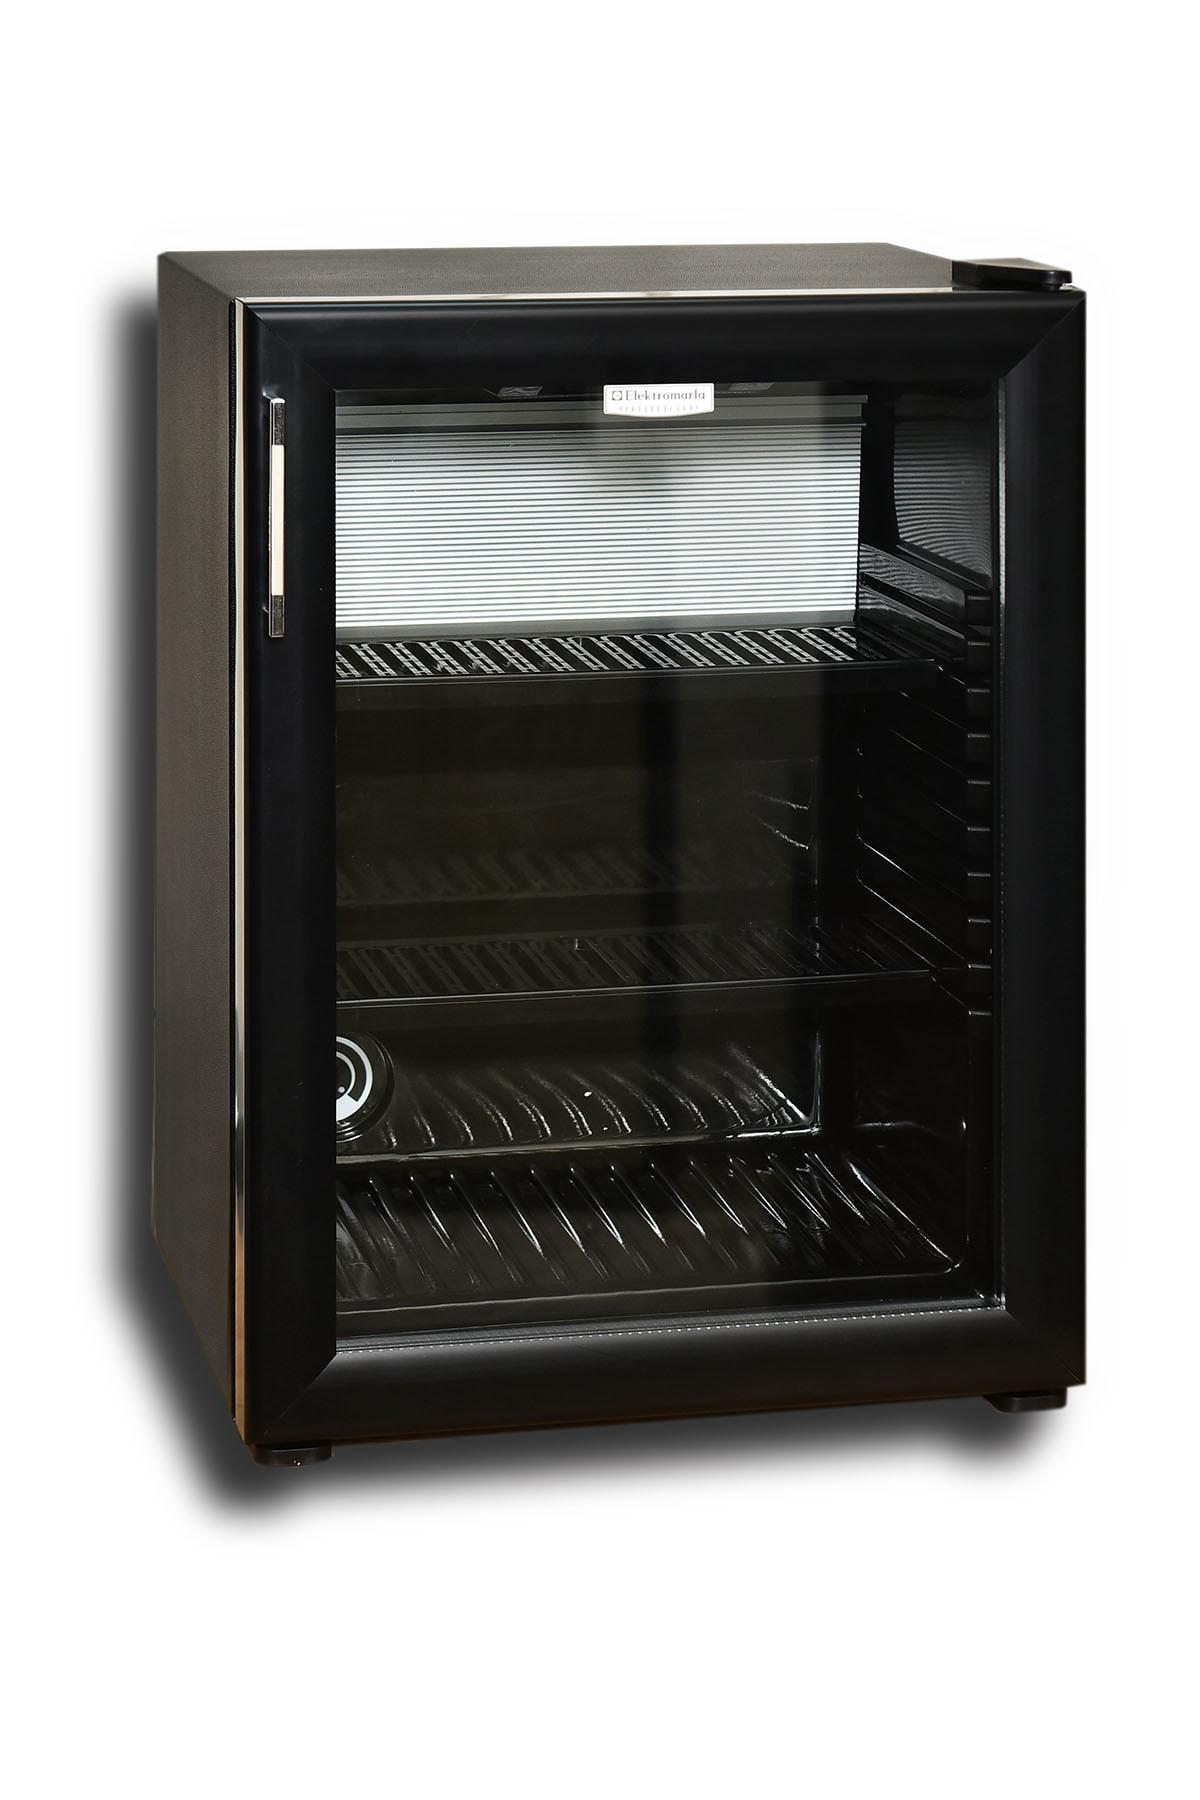 Elektromarla 35 Litre Cam Kapılı Minibar - Black Edition 1